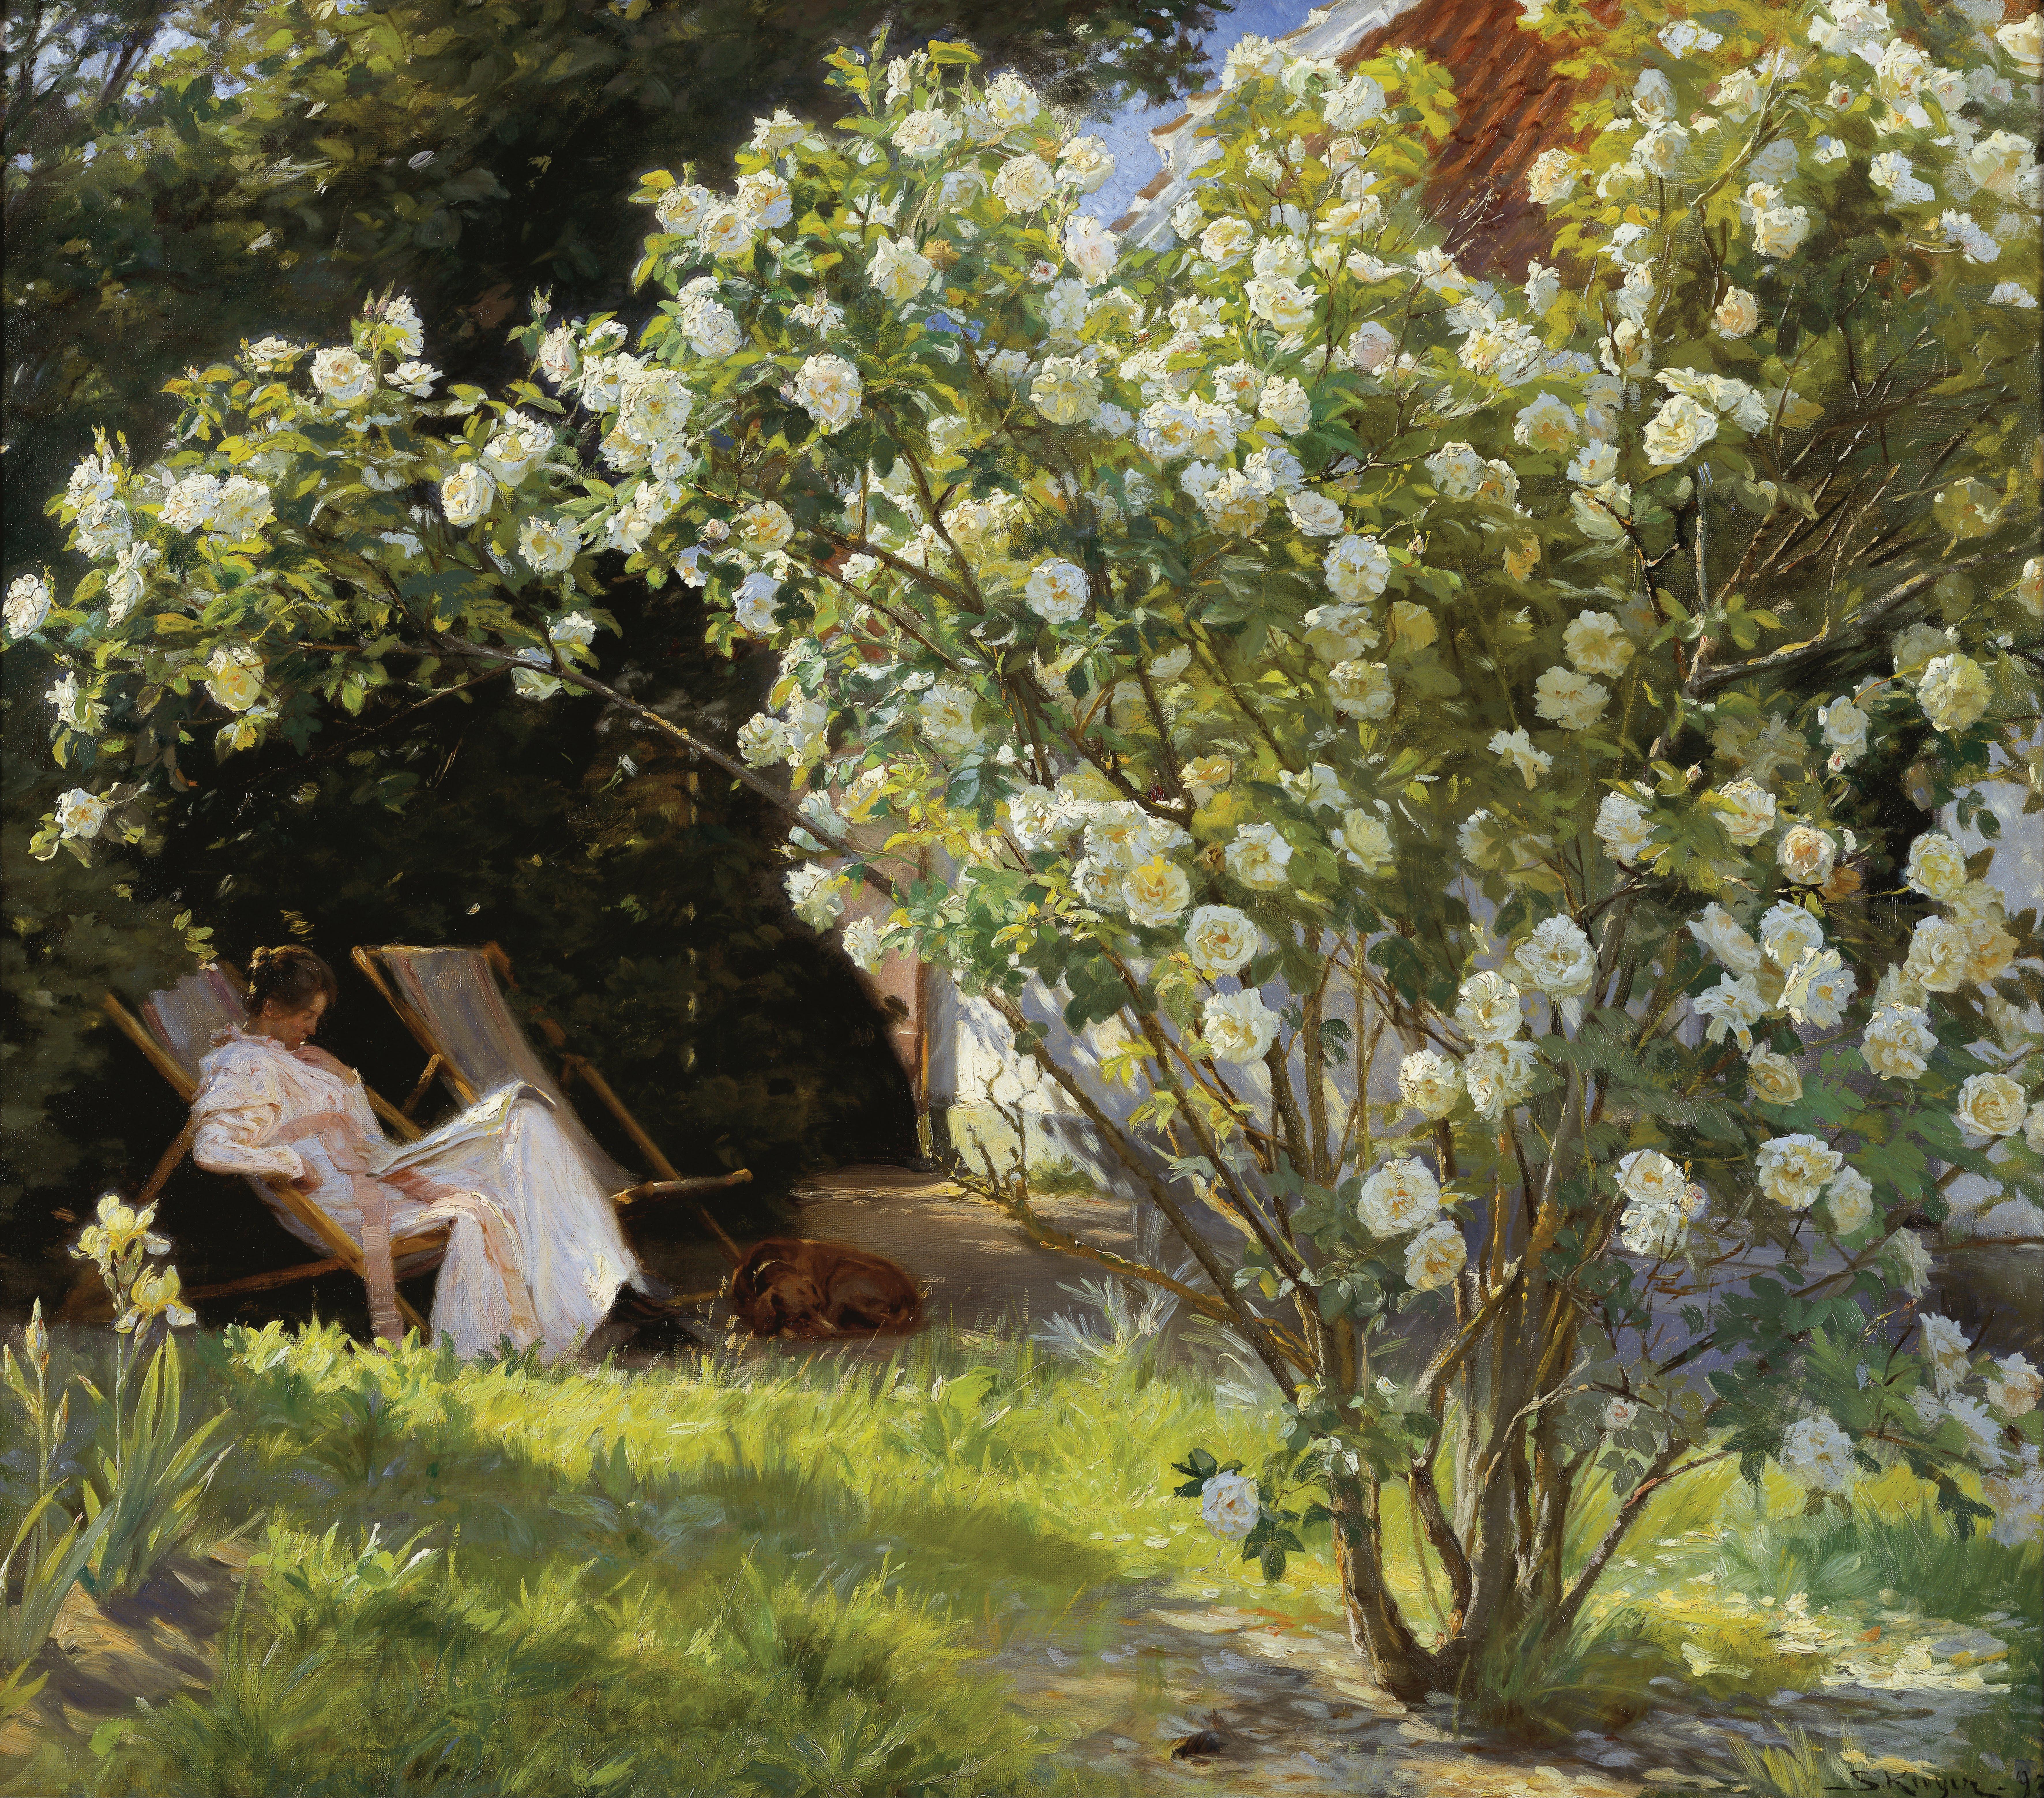 P.S._Kr%C3%B8yer_-_Roses._Marie_Kr%C3%B8yer_seated_in_the_deckchair_in_the_garden_by_Mrs_Bendsen%27s_house_-_Google_Art_Project.jpg